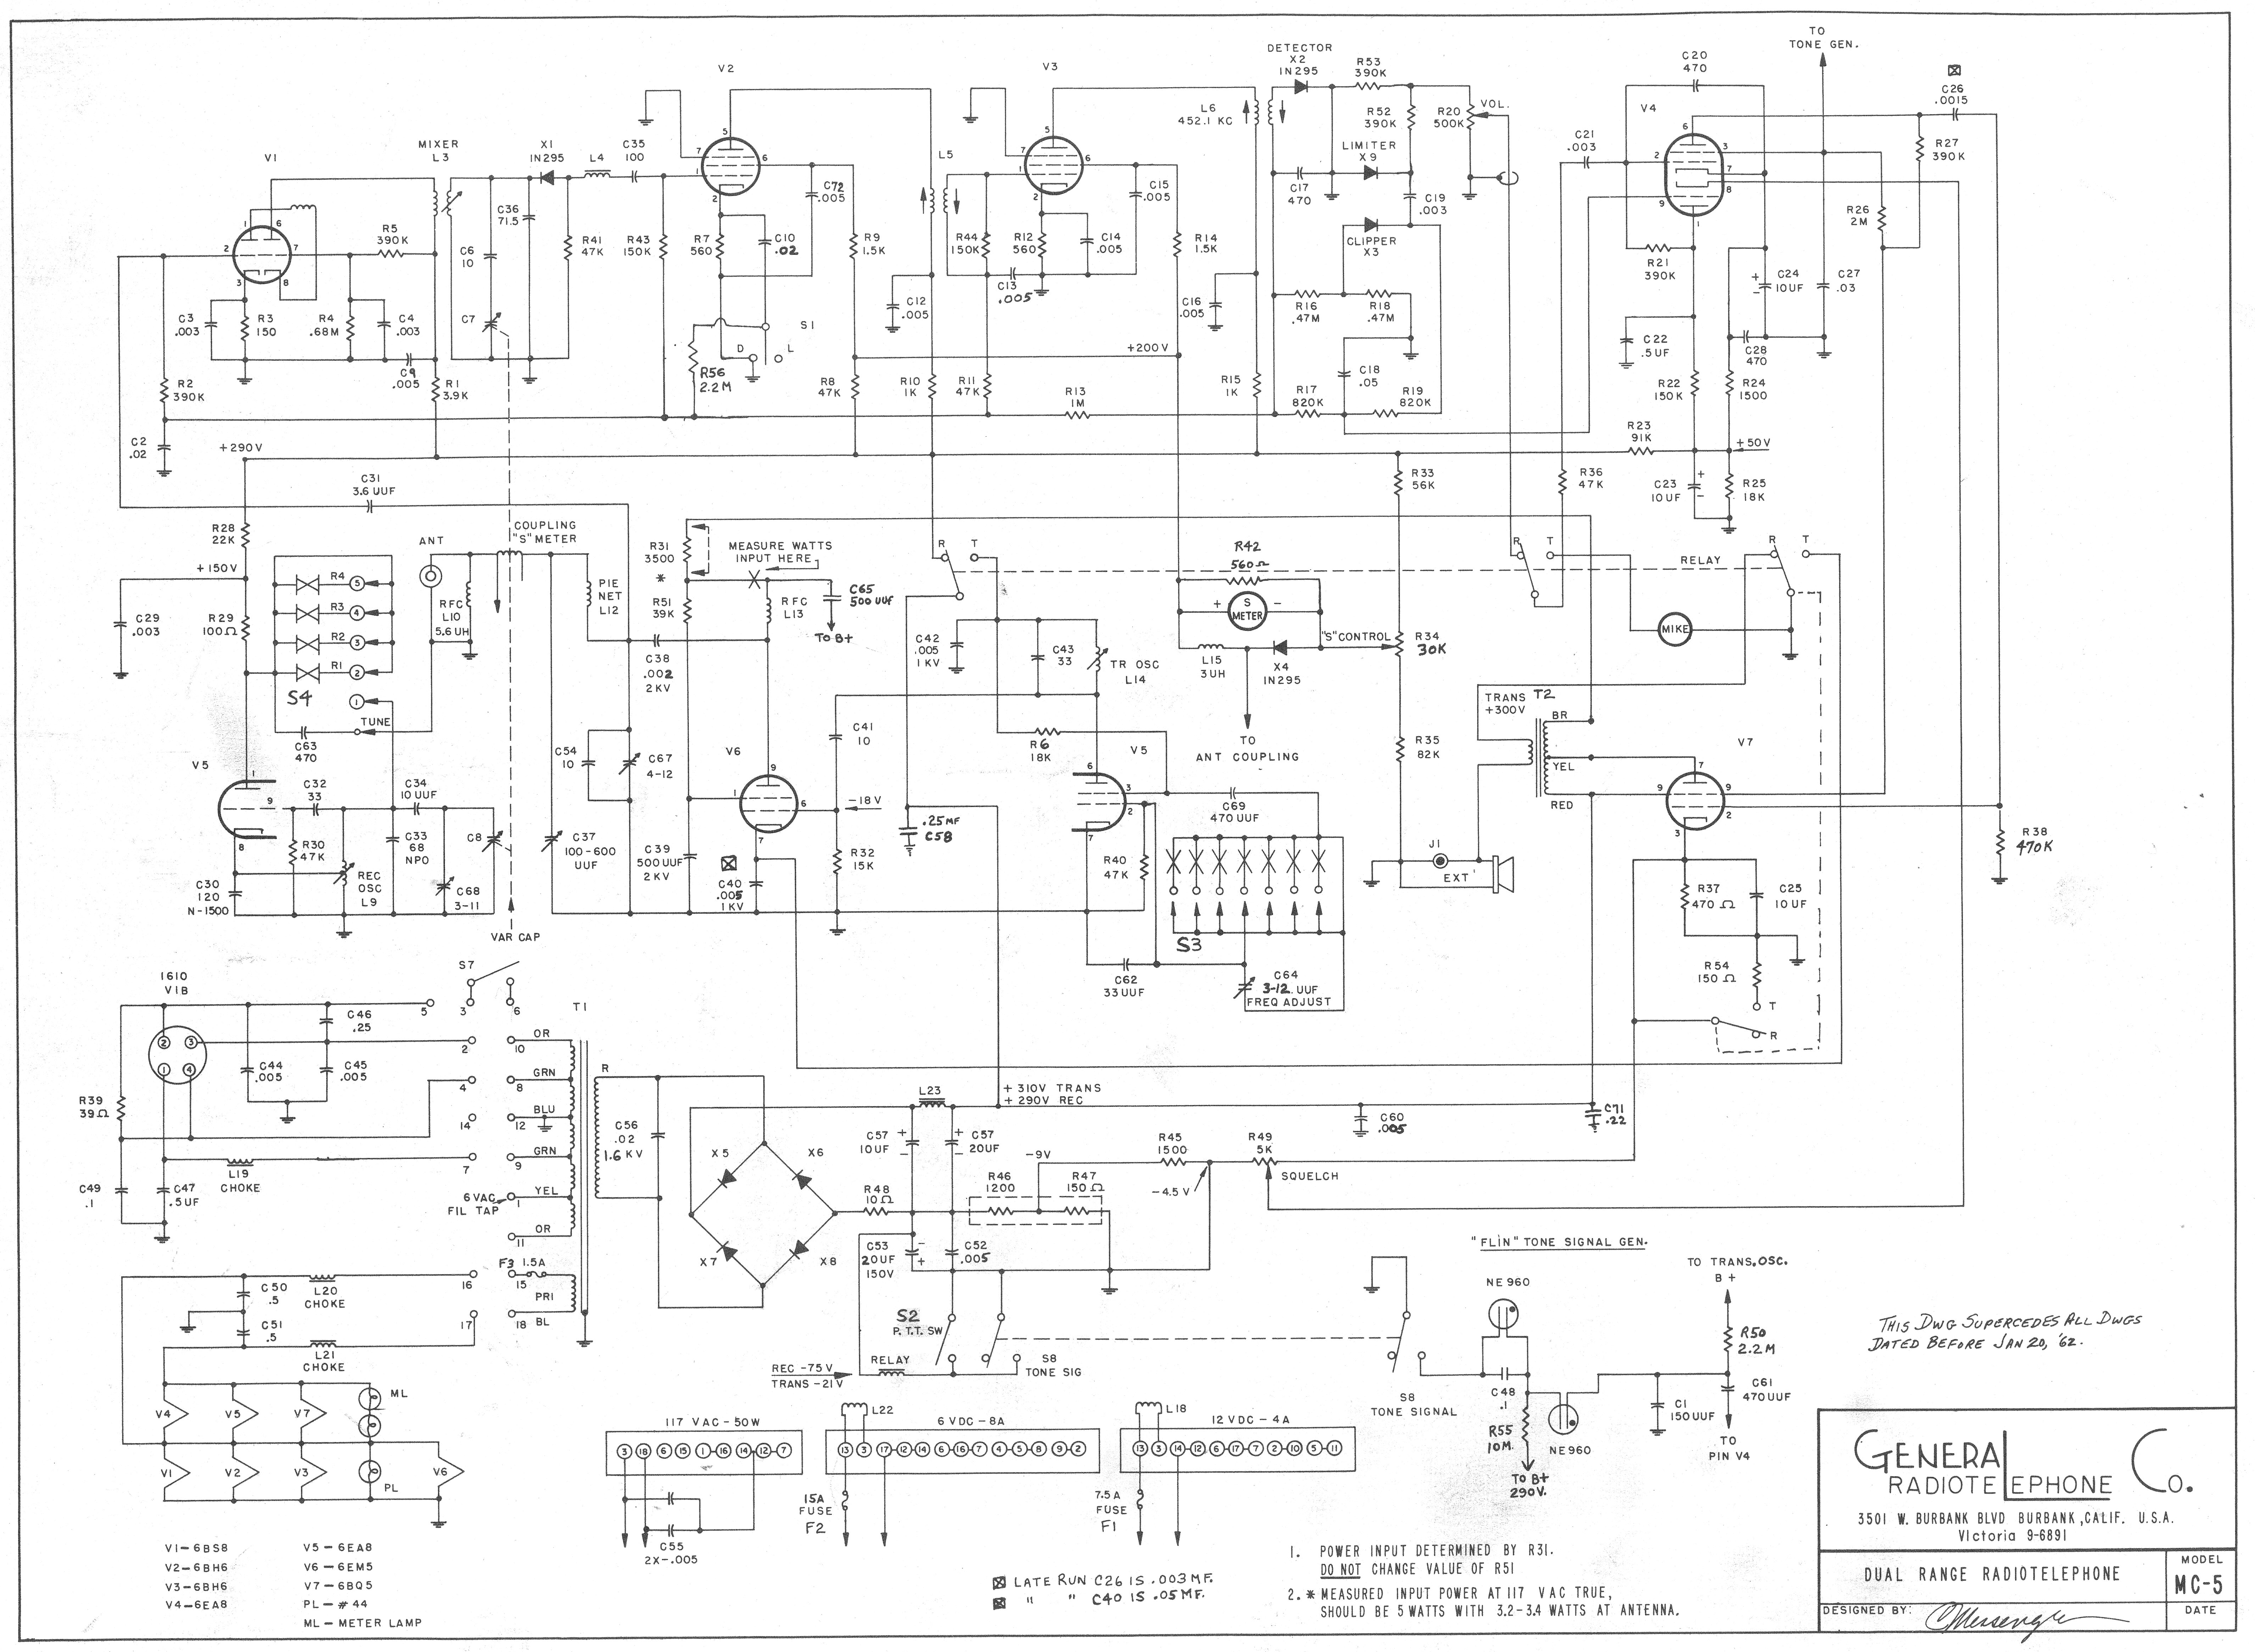 New Circuits Page 78 Circuitdiagramtointerfacebuzzerwithavrslicker Radio General Telephone Mc5 Manual Esi Wiring